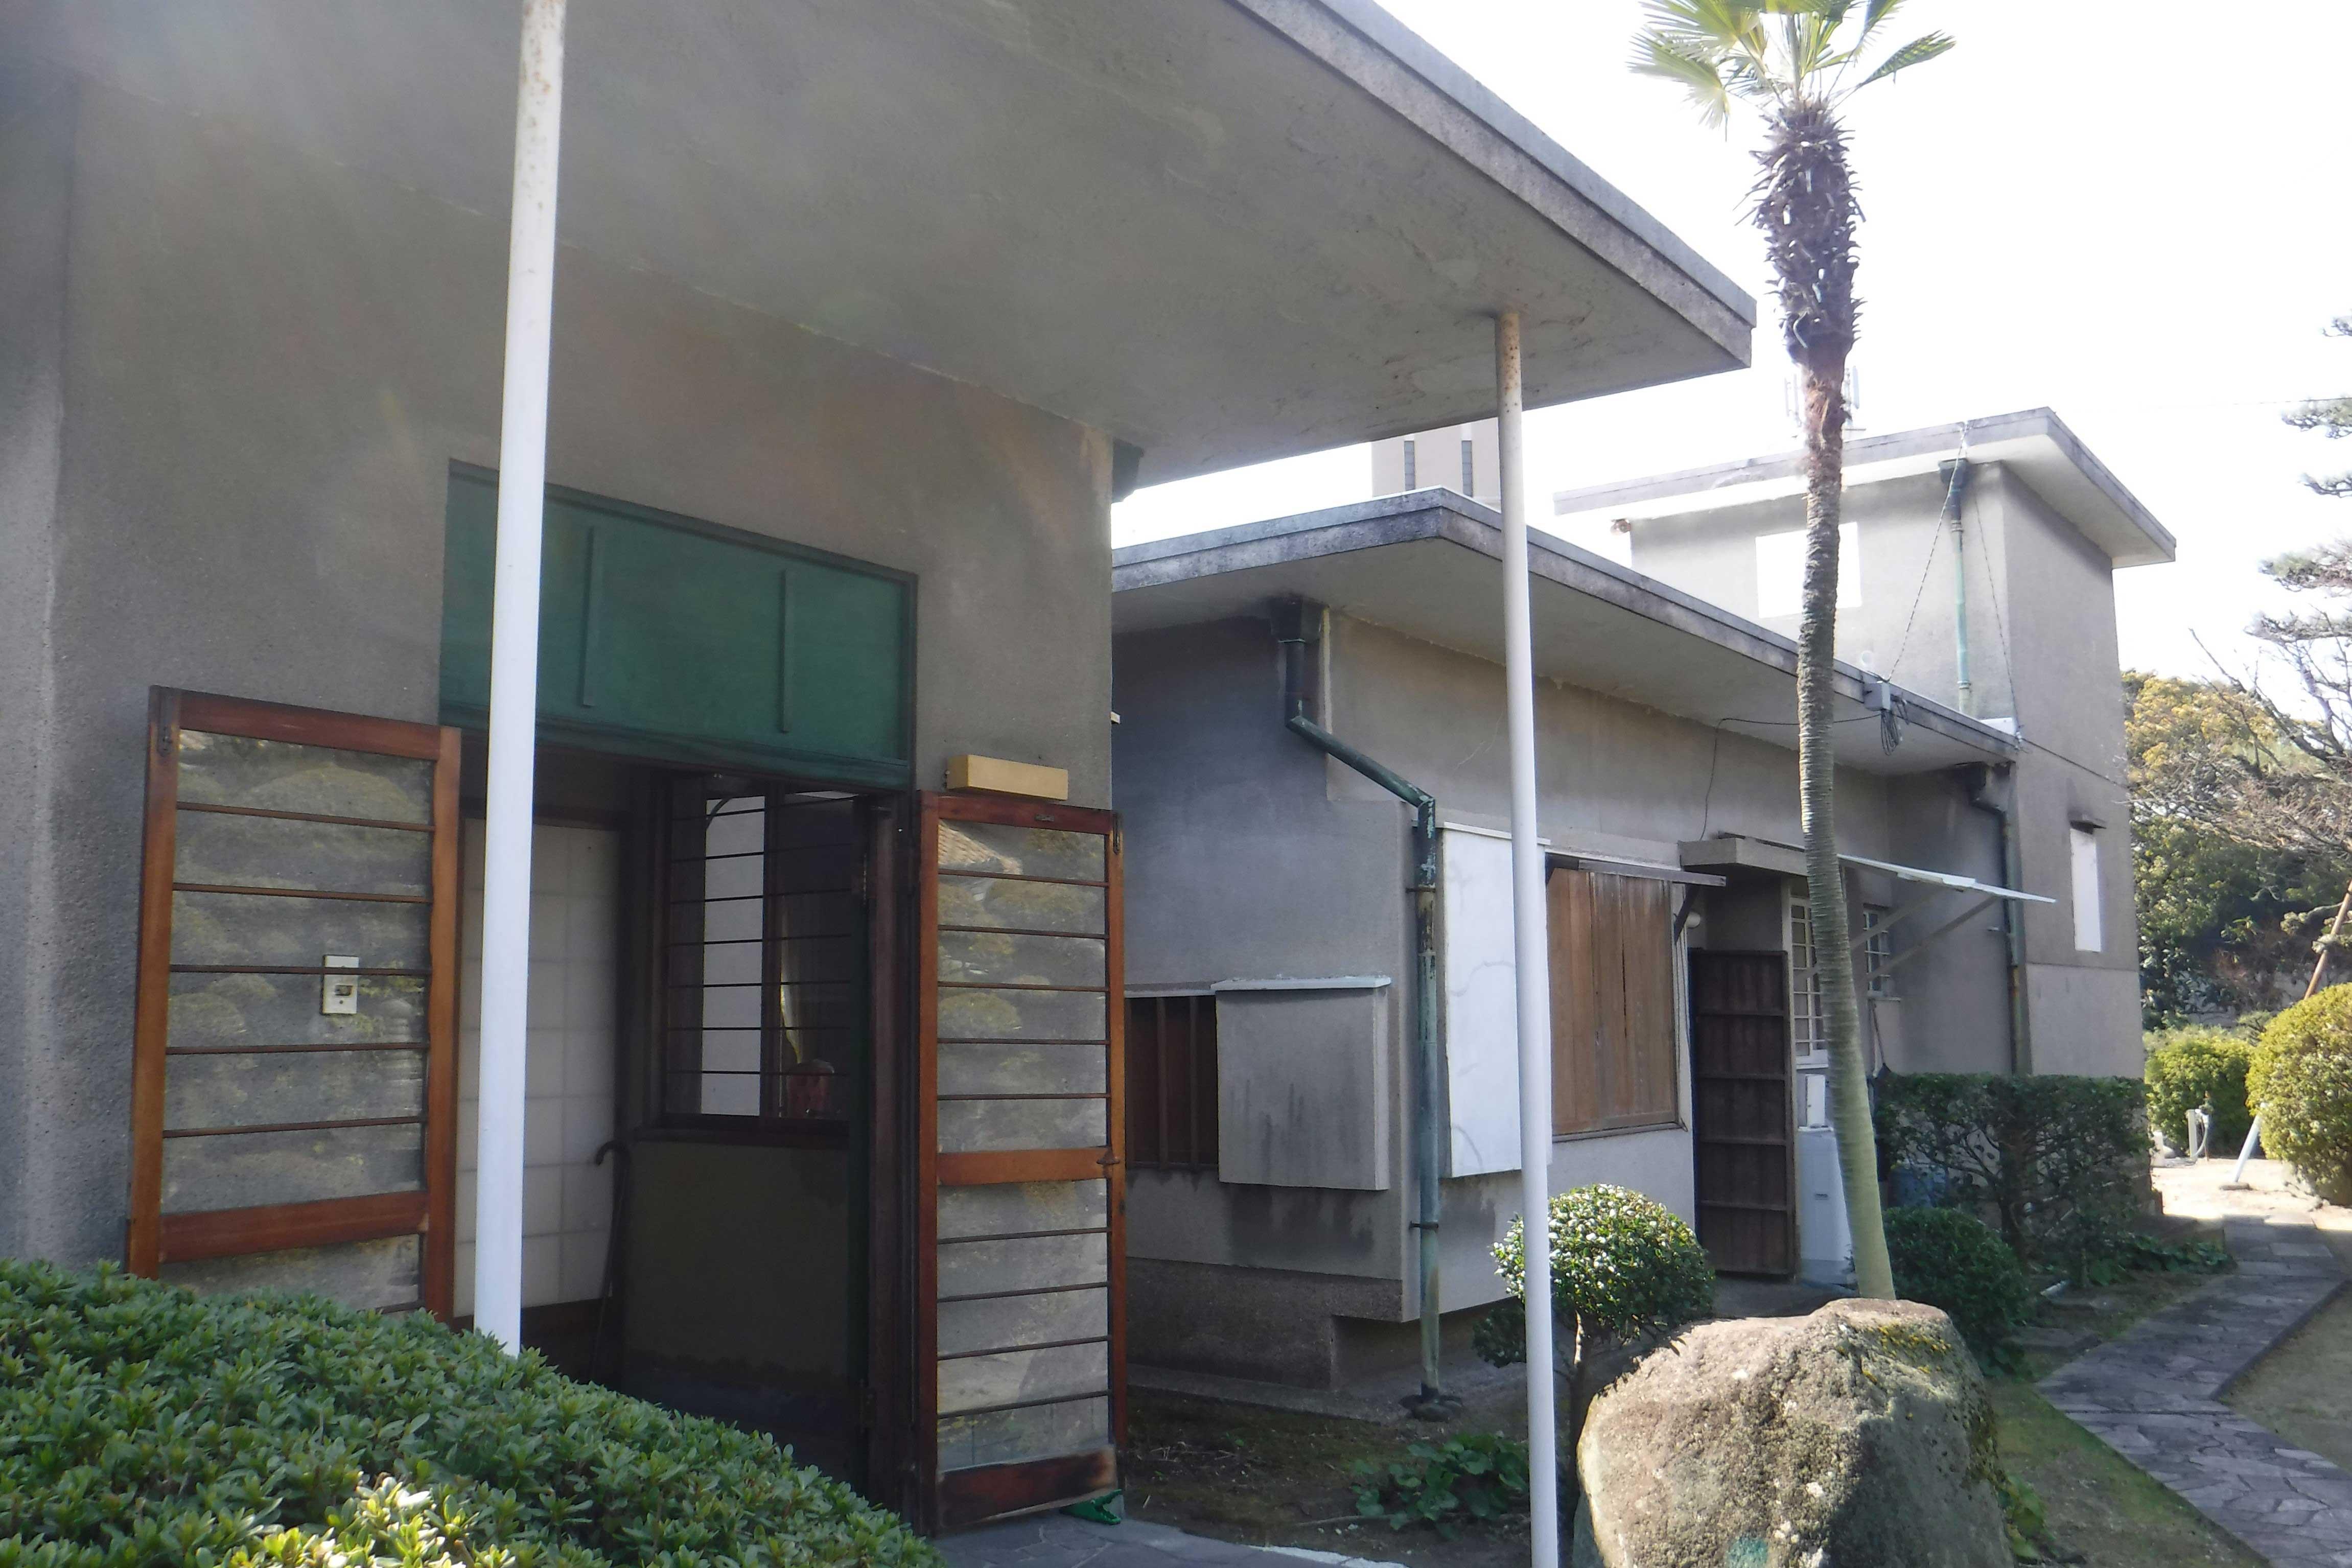 <p>新宅 玄関廻り</p>東半の客室部に玄関を構えた鉄筋コンクリート造住宅である。